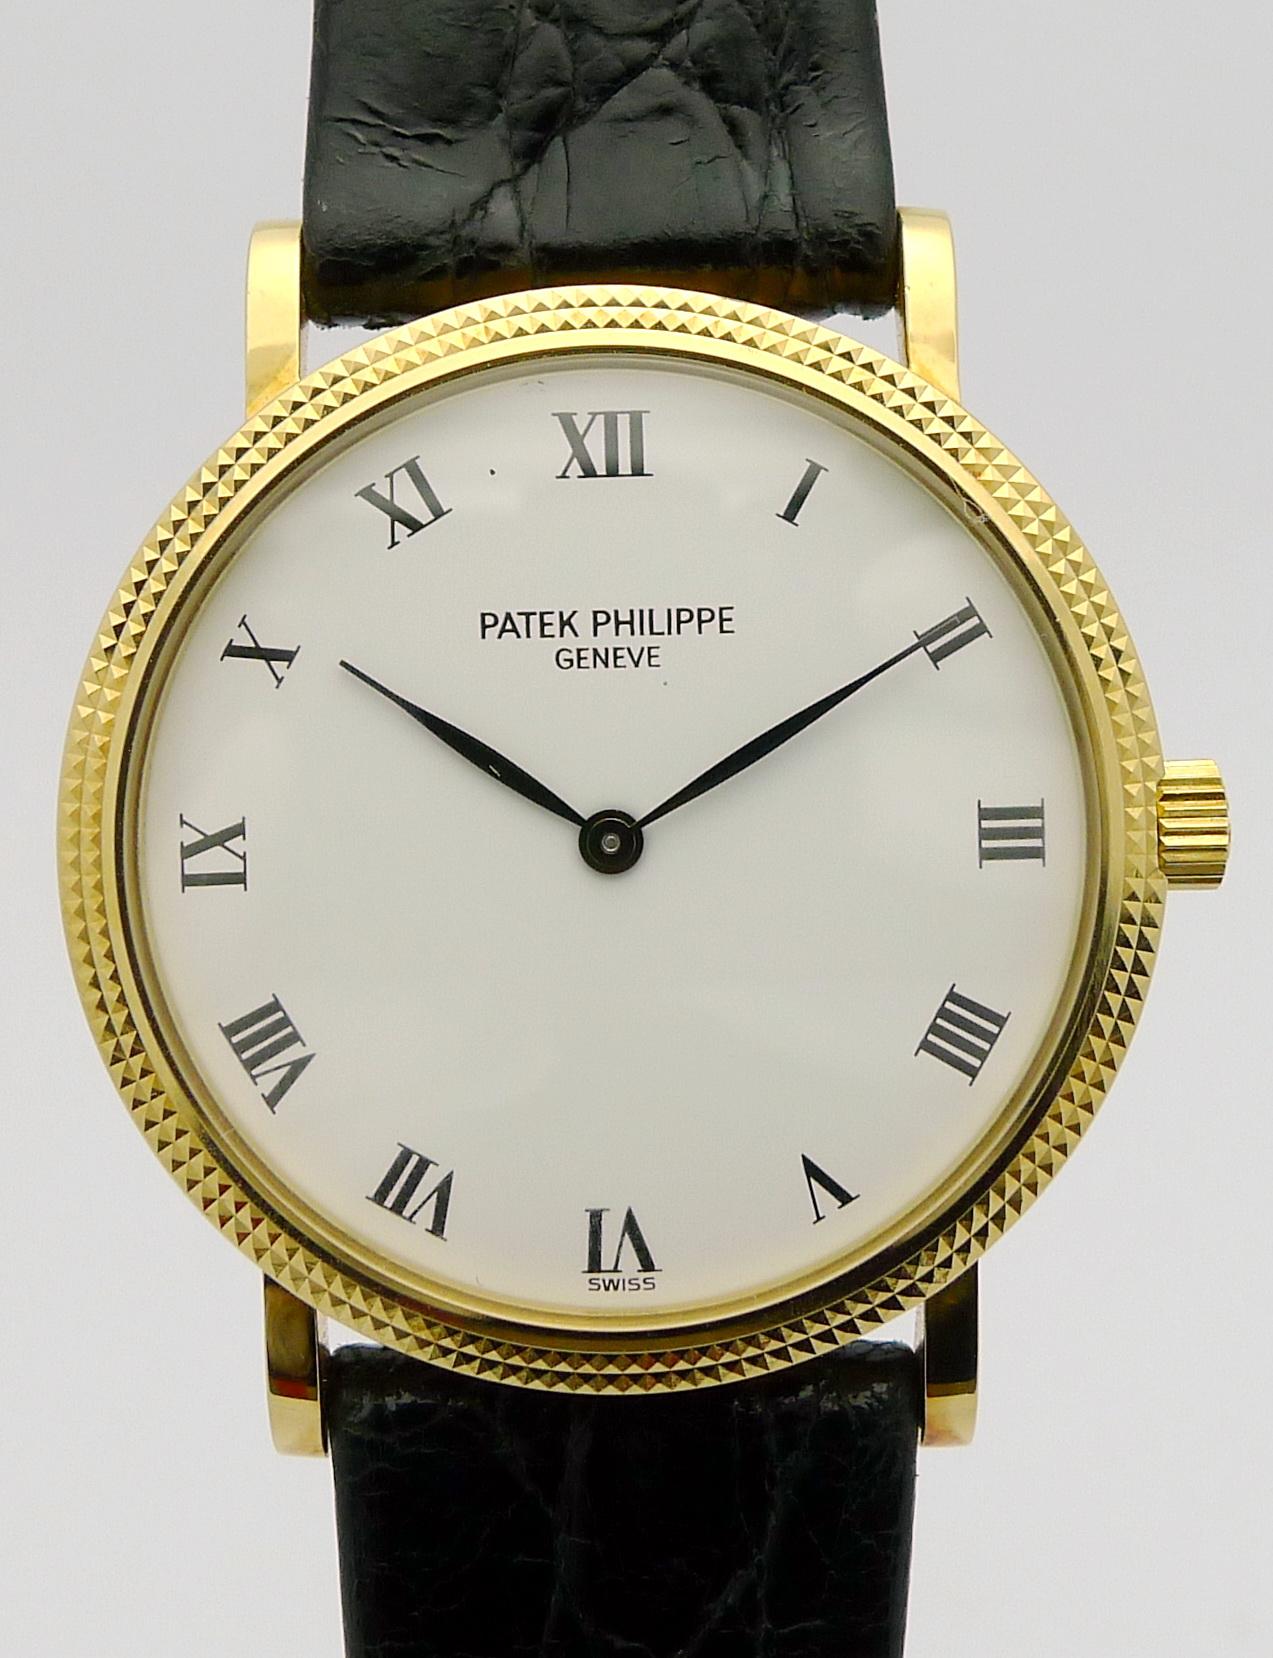 Patek Philippe Pp 5205 R Rosegold Black Dial Annual: Patek Philippe Calatrava 18ct Gold Herren Automatik